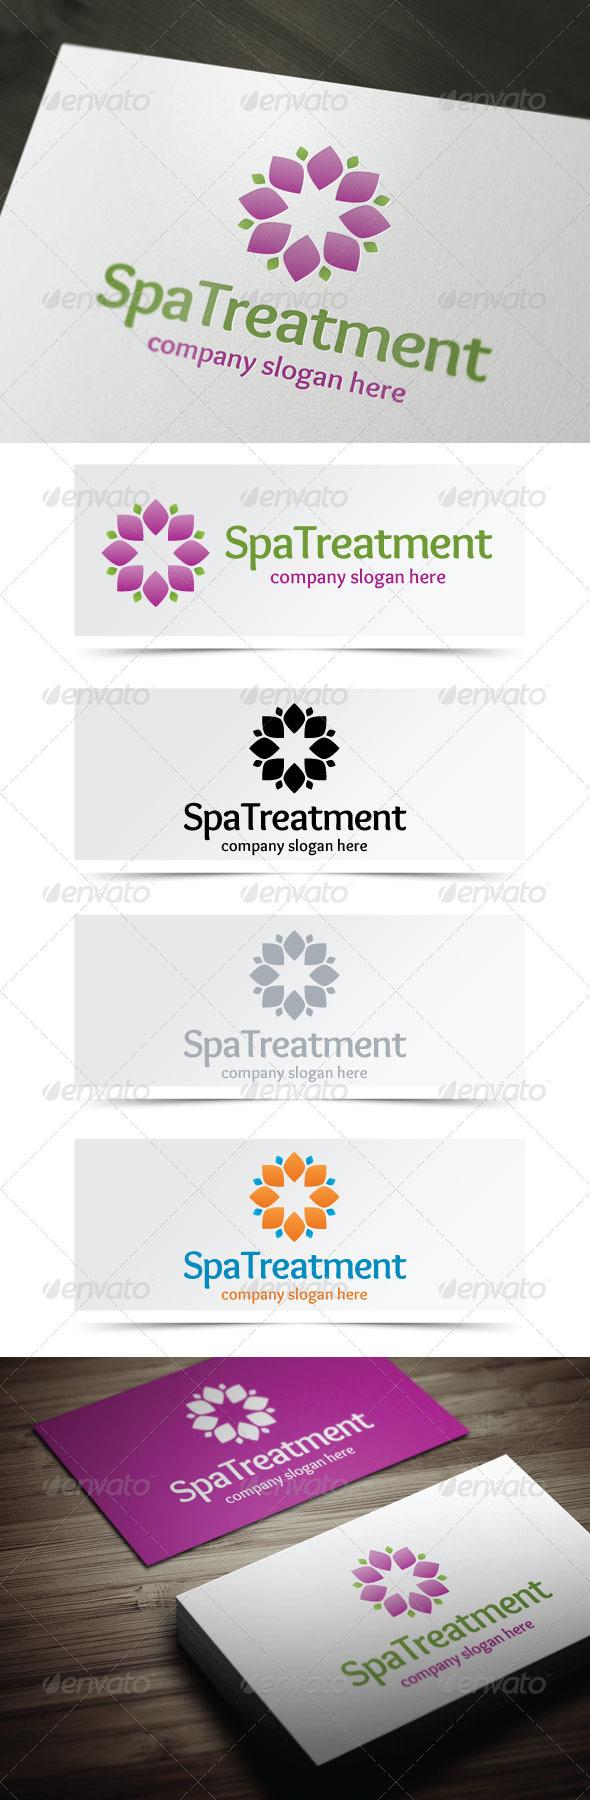 Spa Treatment  - Abstract Logo Templates